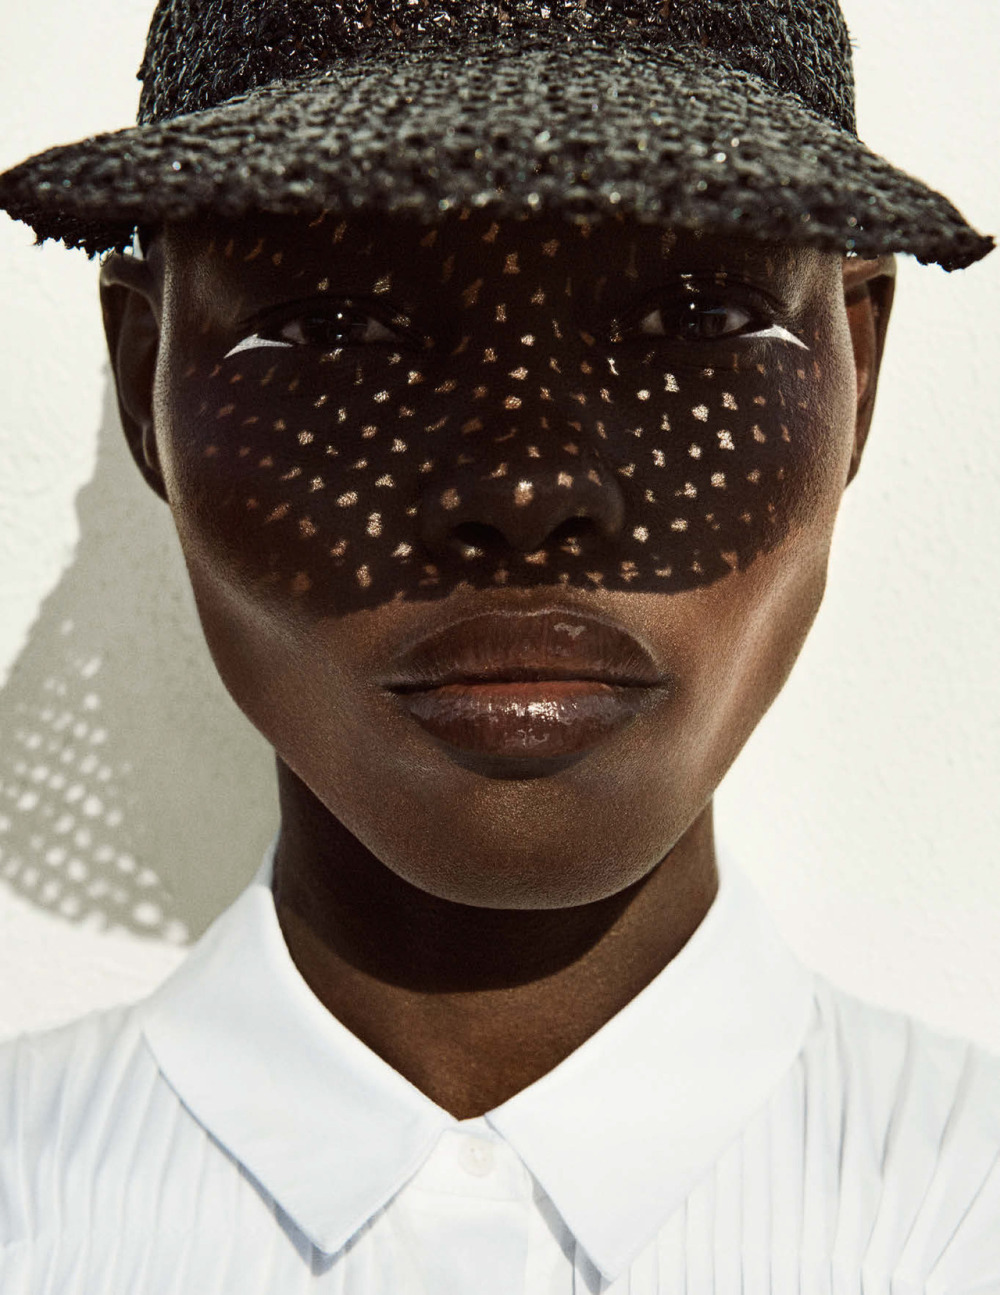 Vogue時尚雜志德國版2018年五月刊攝影師Giampaolo Sgura時尚雜志大片:天然美女